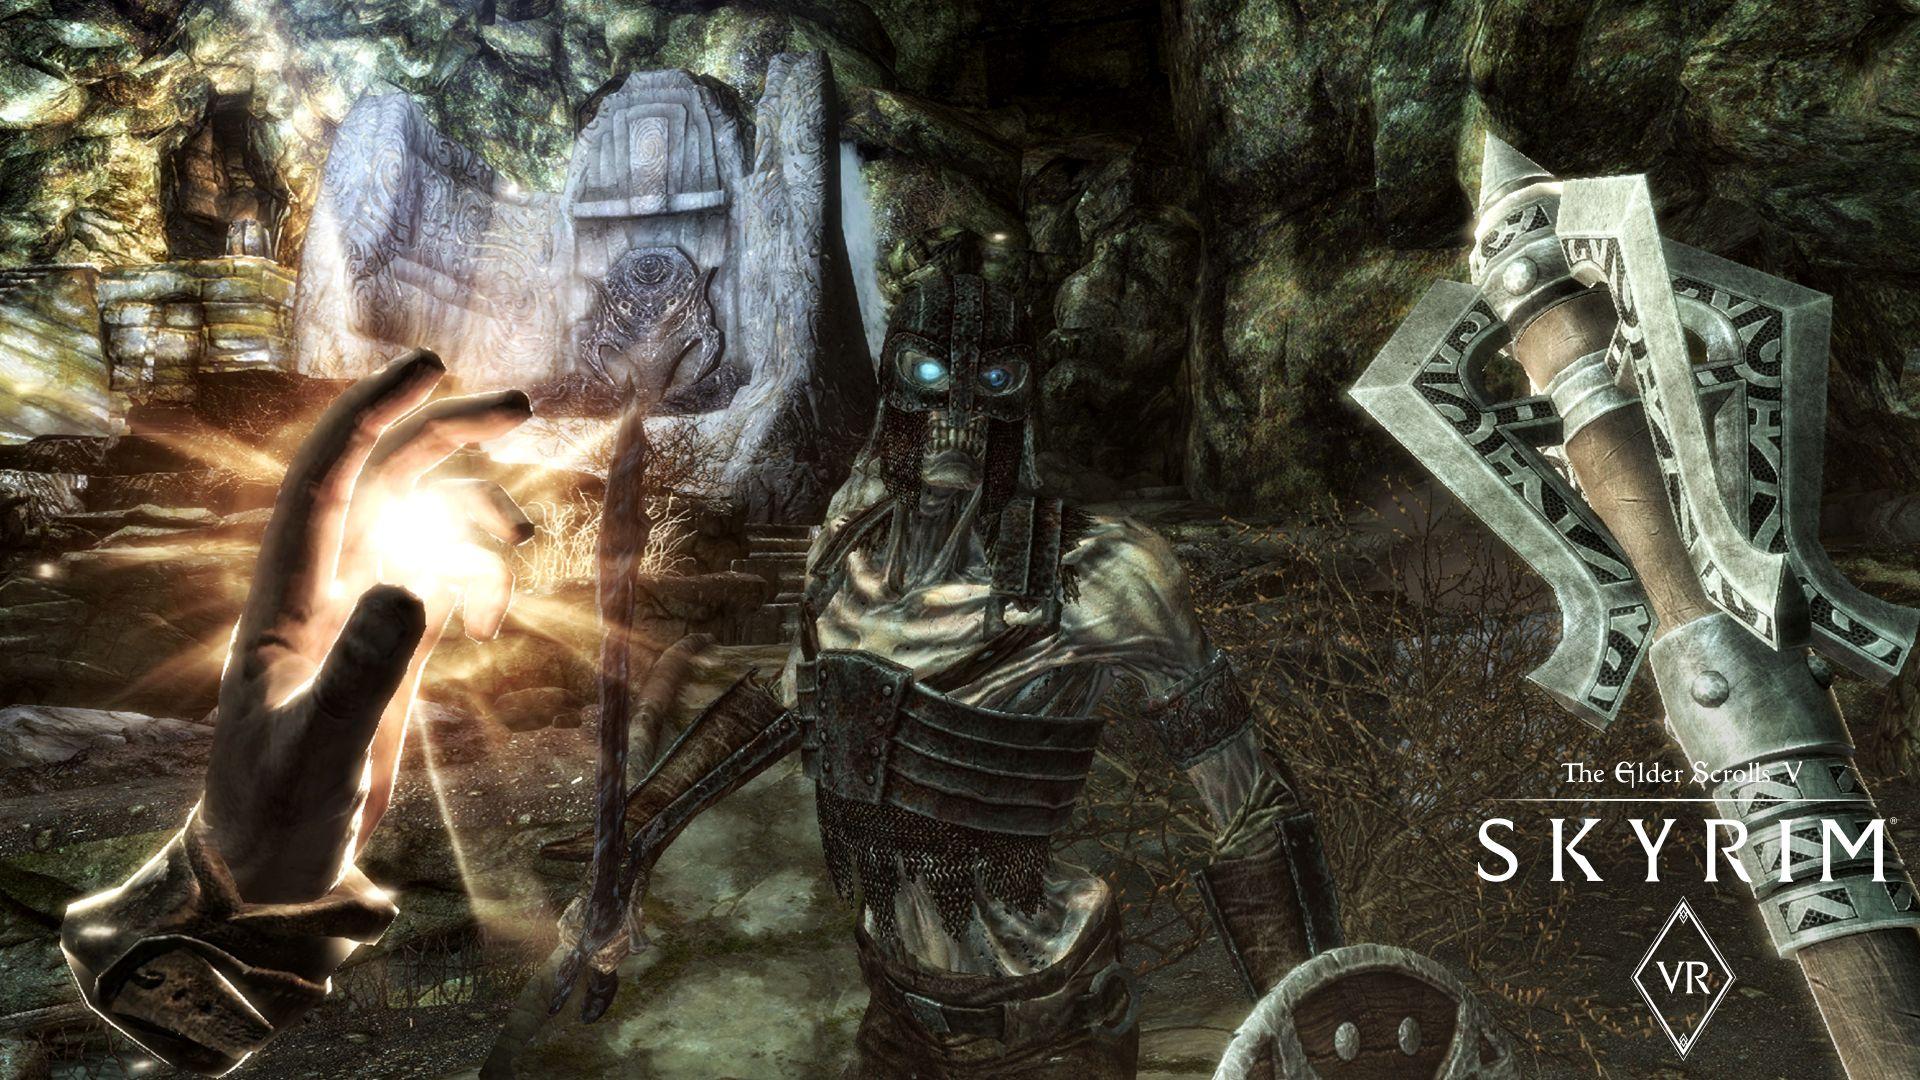 Skyrim_VR_PC_Draugr_Full_Size